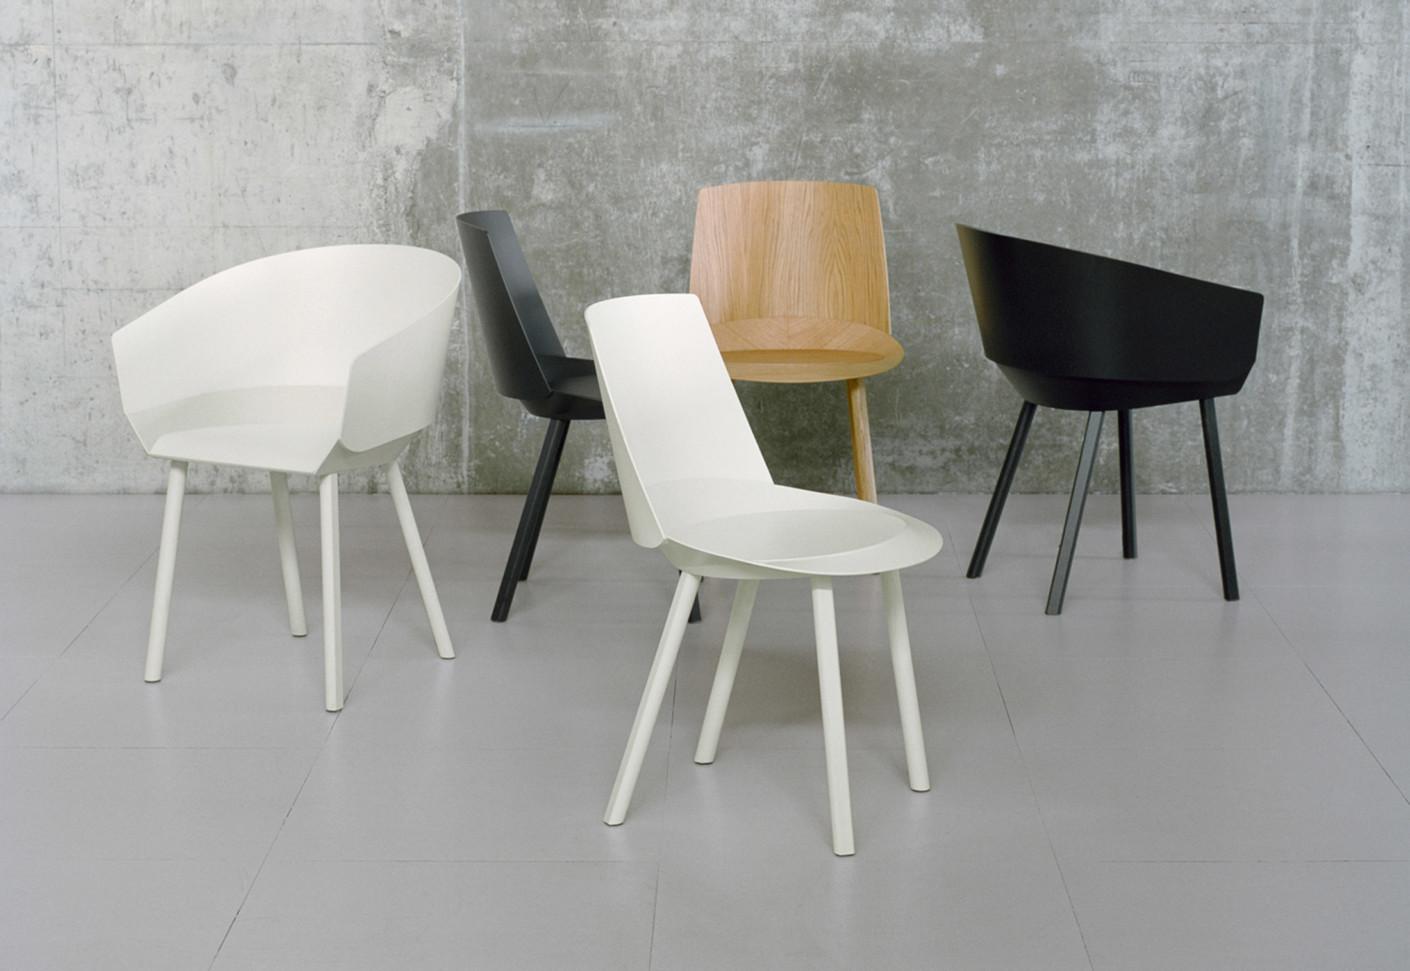 houdini stuhl mit armlehne von e15 stylepark. Black Bedroom Furniture Sets. Home Design Ideas